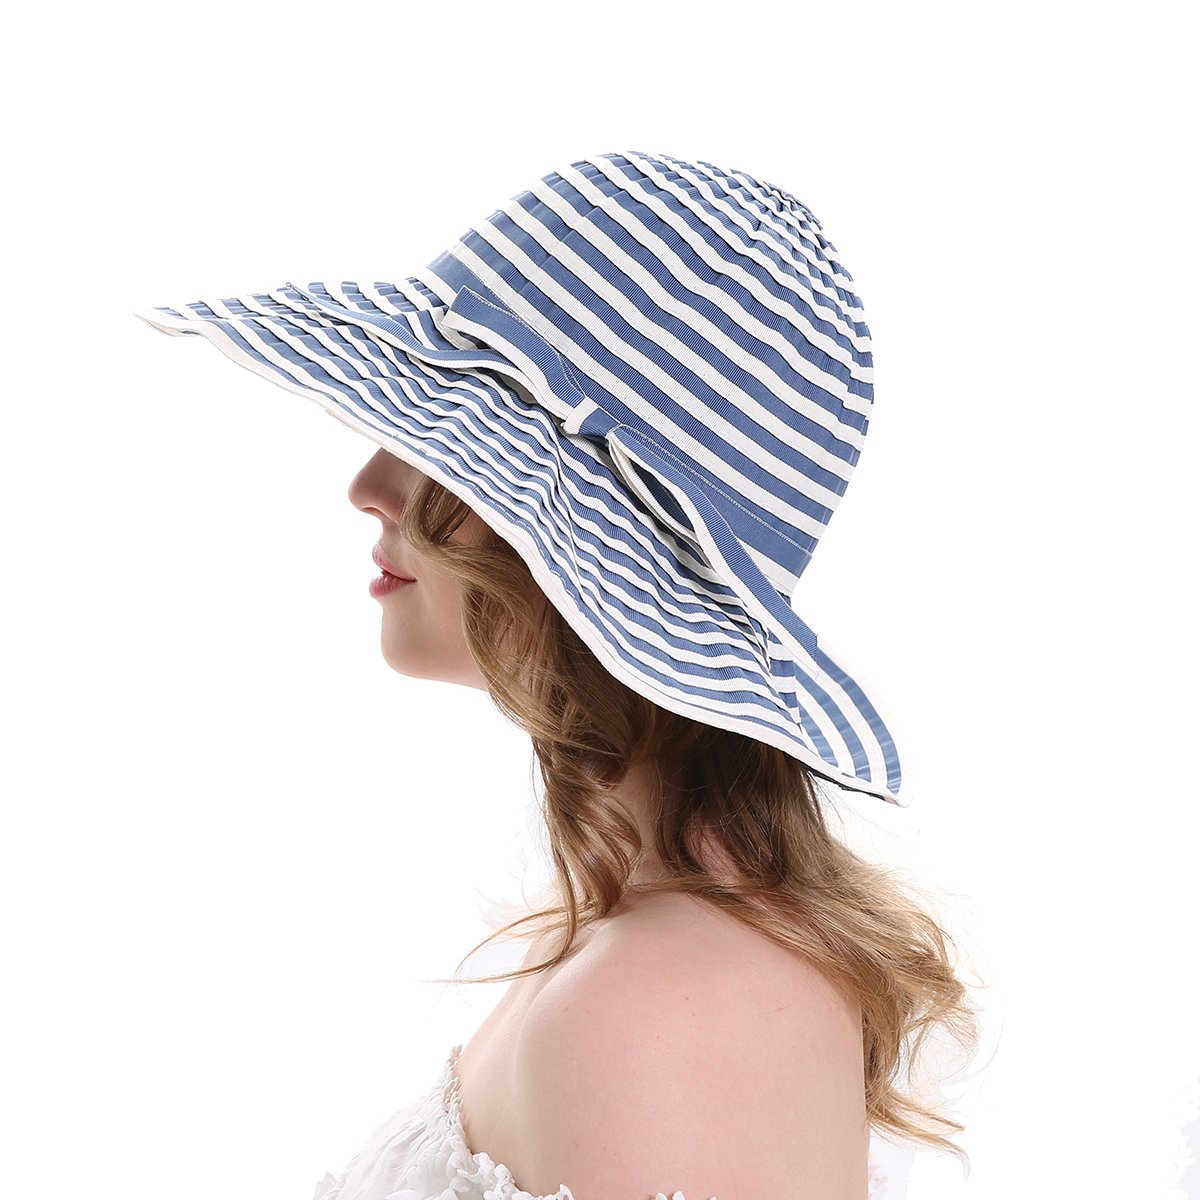 MEEFUR Womens Summer Lightweight Sun Hats Breathable Fabric UPF 50+ Beach Hat Stripes Foldable Wide Brim Narrow Bowknot Cap Floppy Blue